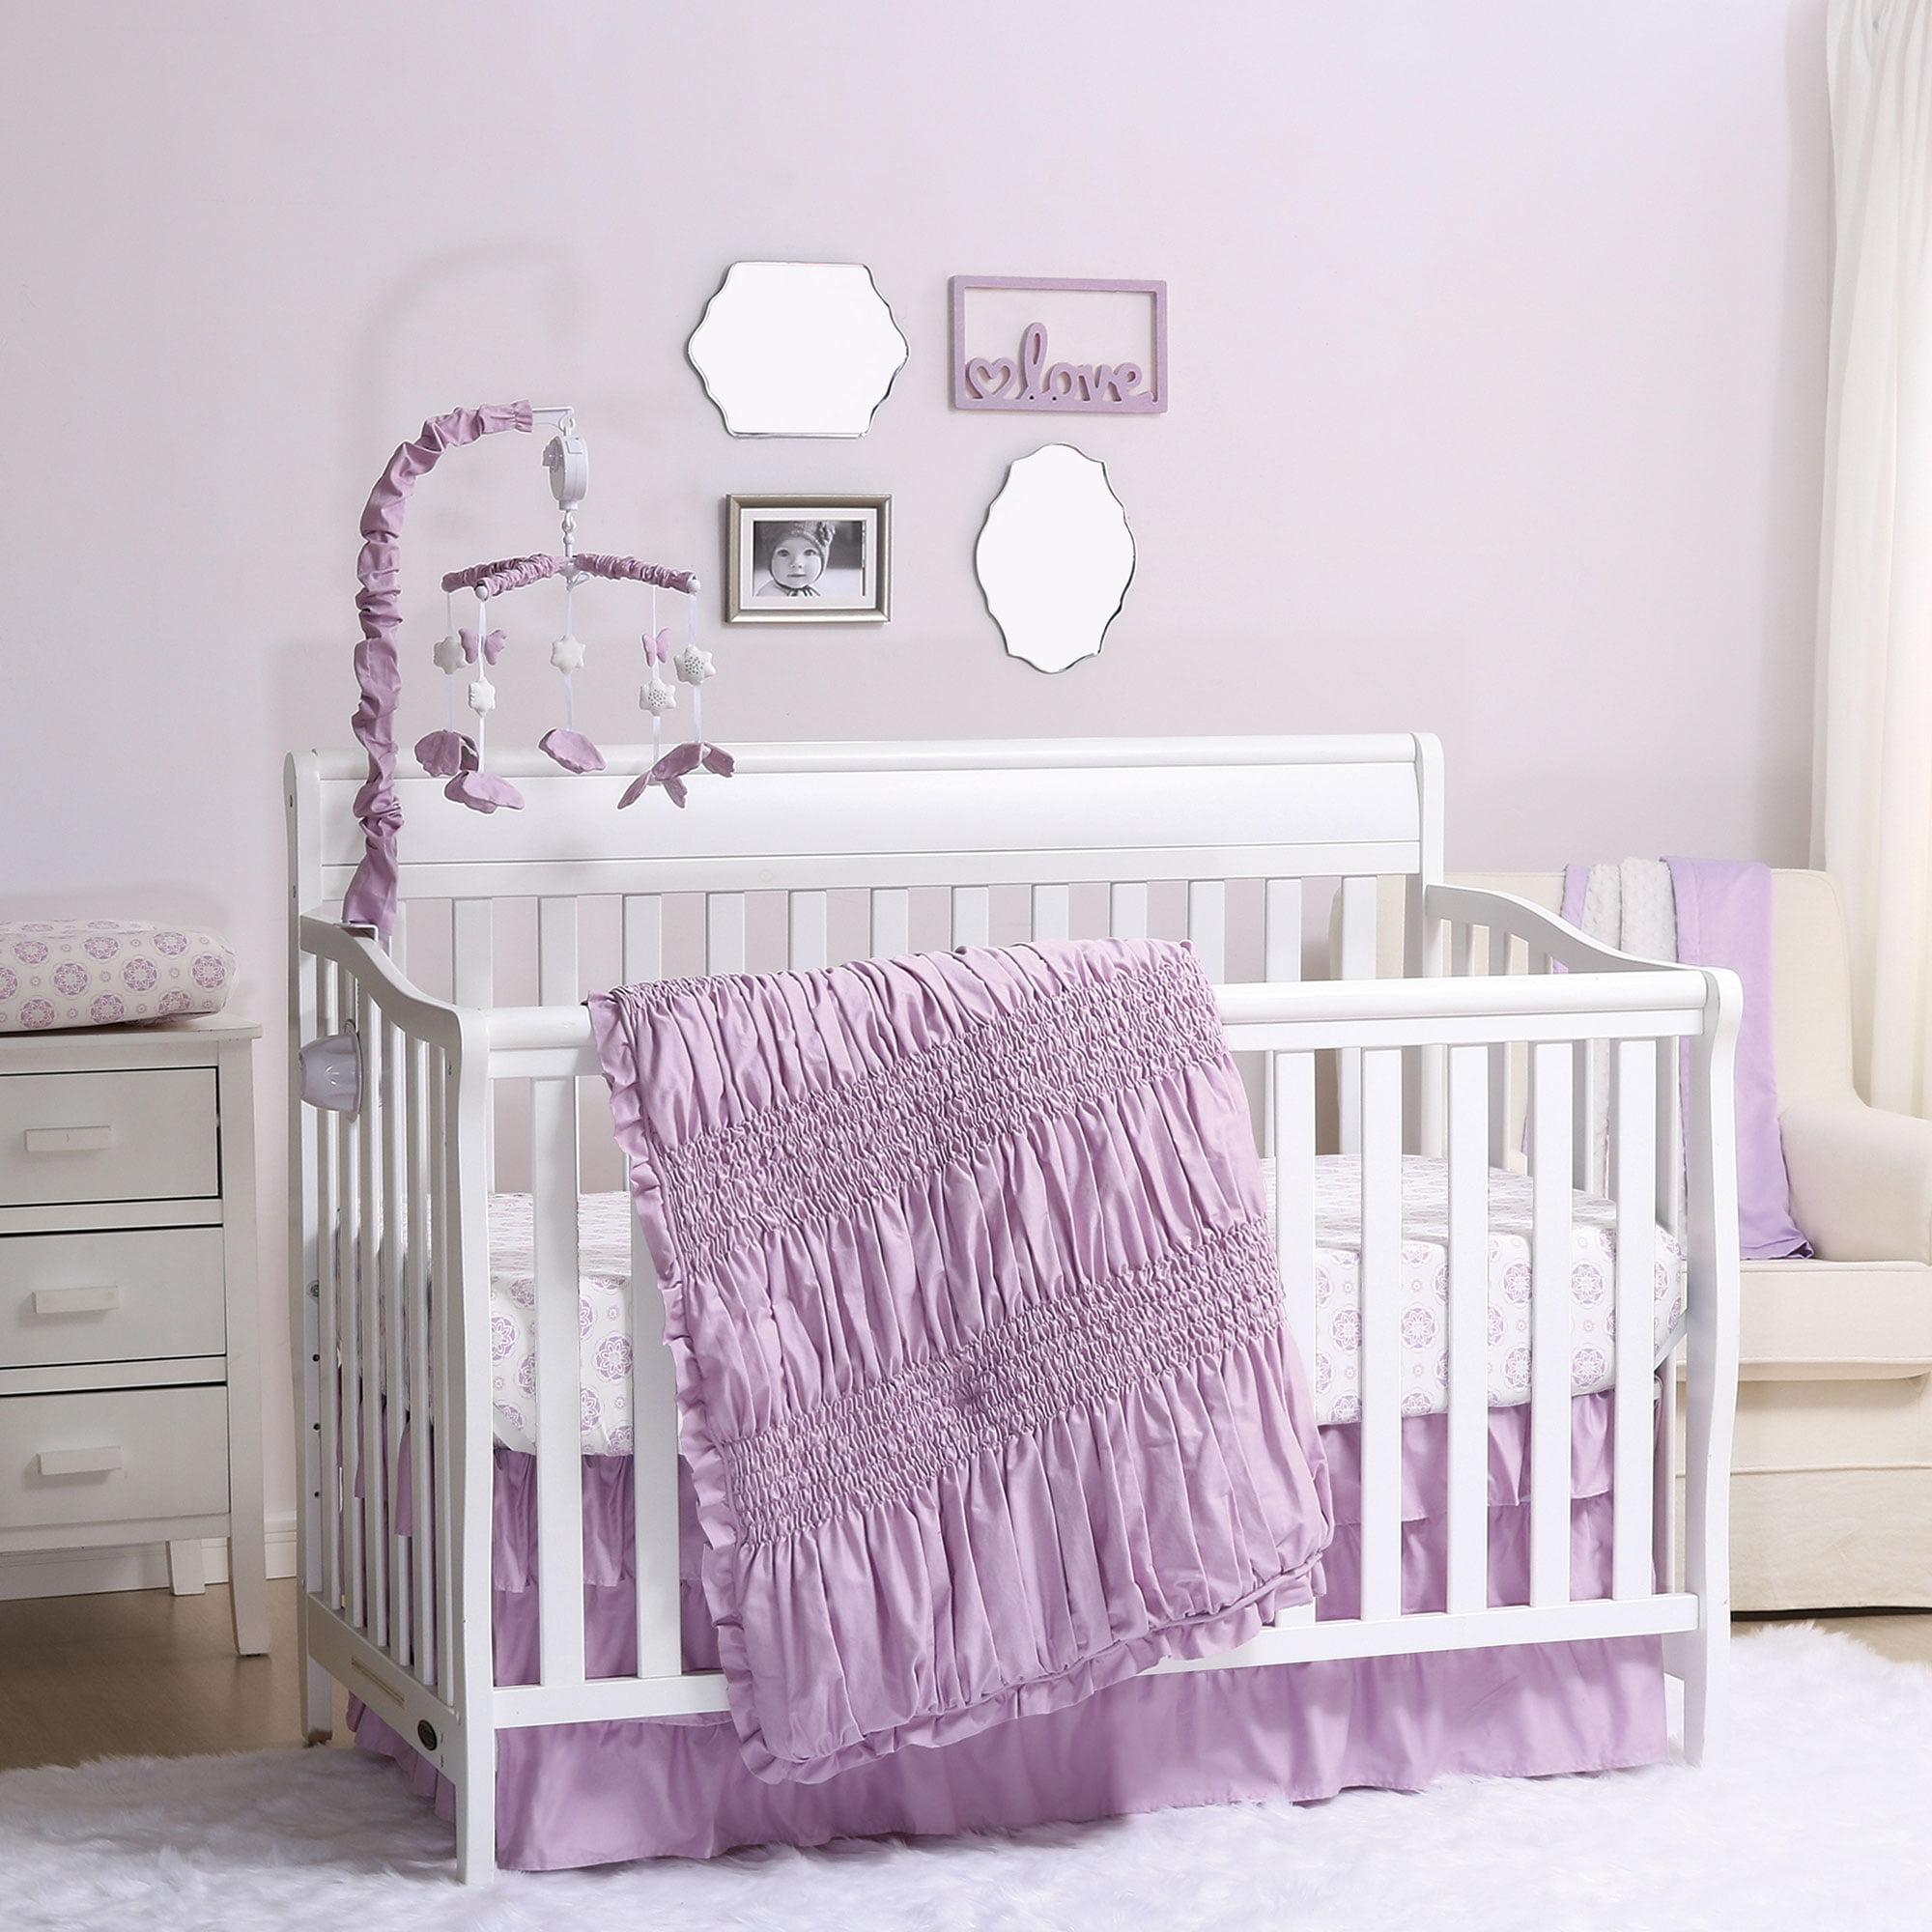 Lilac Kisses Purple Baby Girl Crib Bedding - 20 Piece Nursery Essentials Set